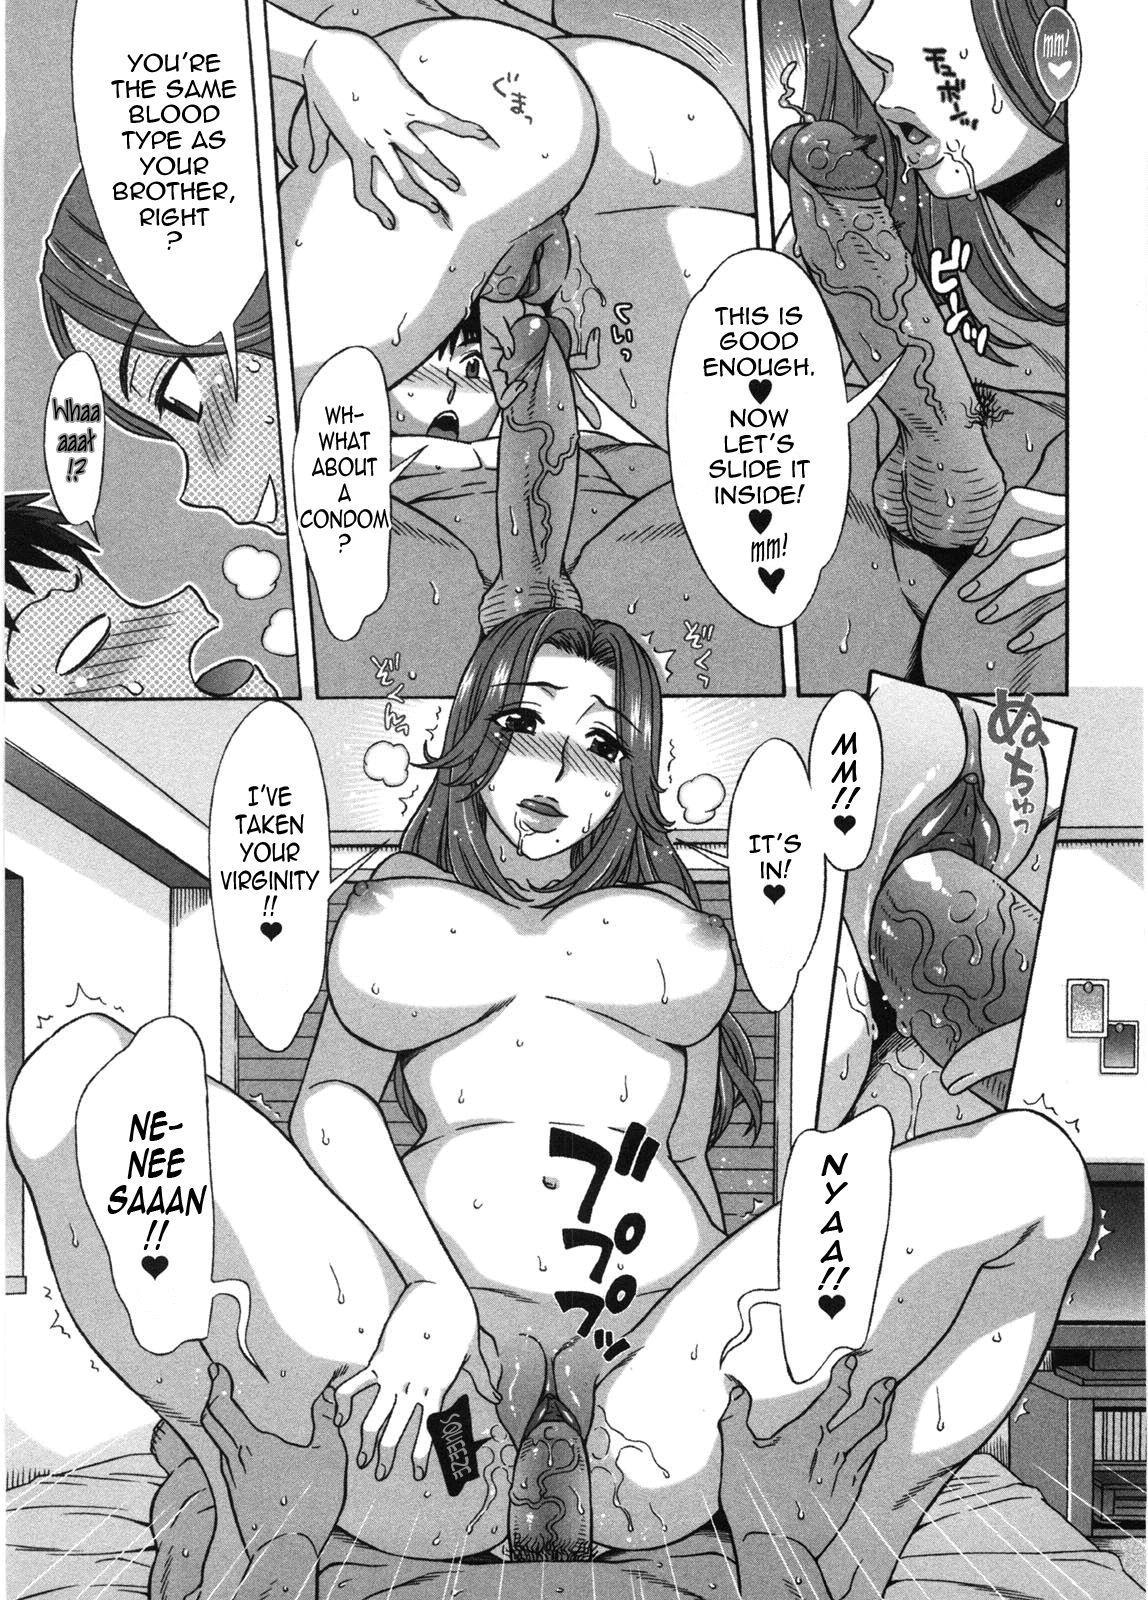 [Hanzaki Jirou] Ama Ero - Sweet Sugar Baby Ch. 1-7 [English] [Tadanohito] [Decensored] 117